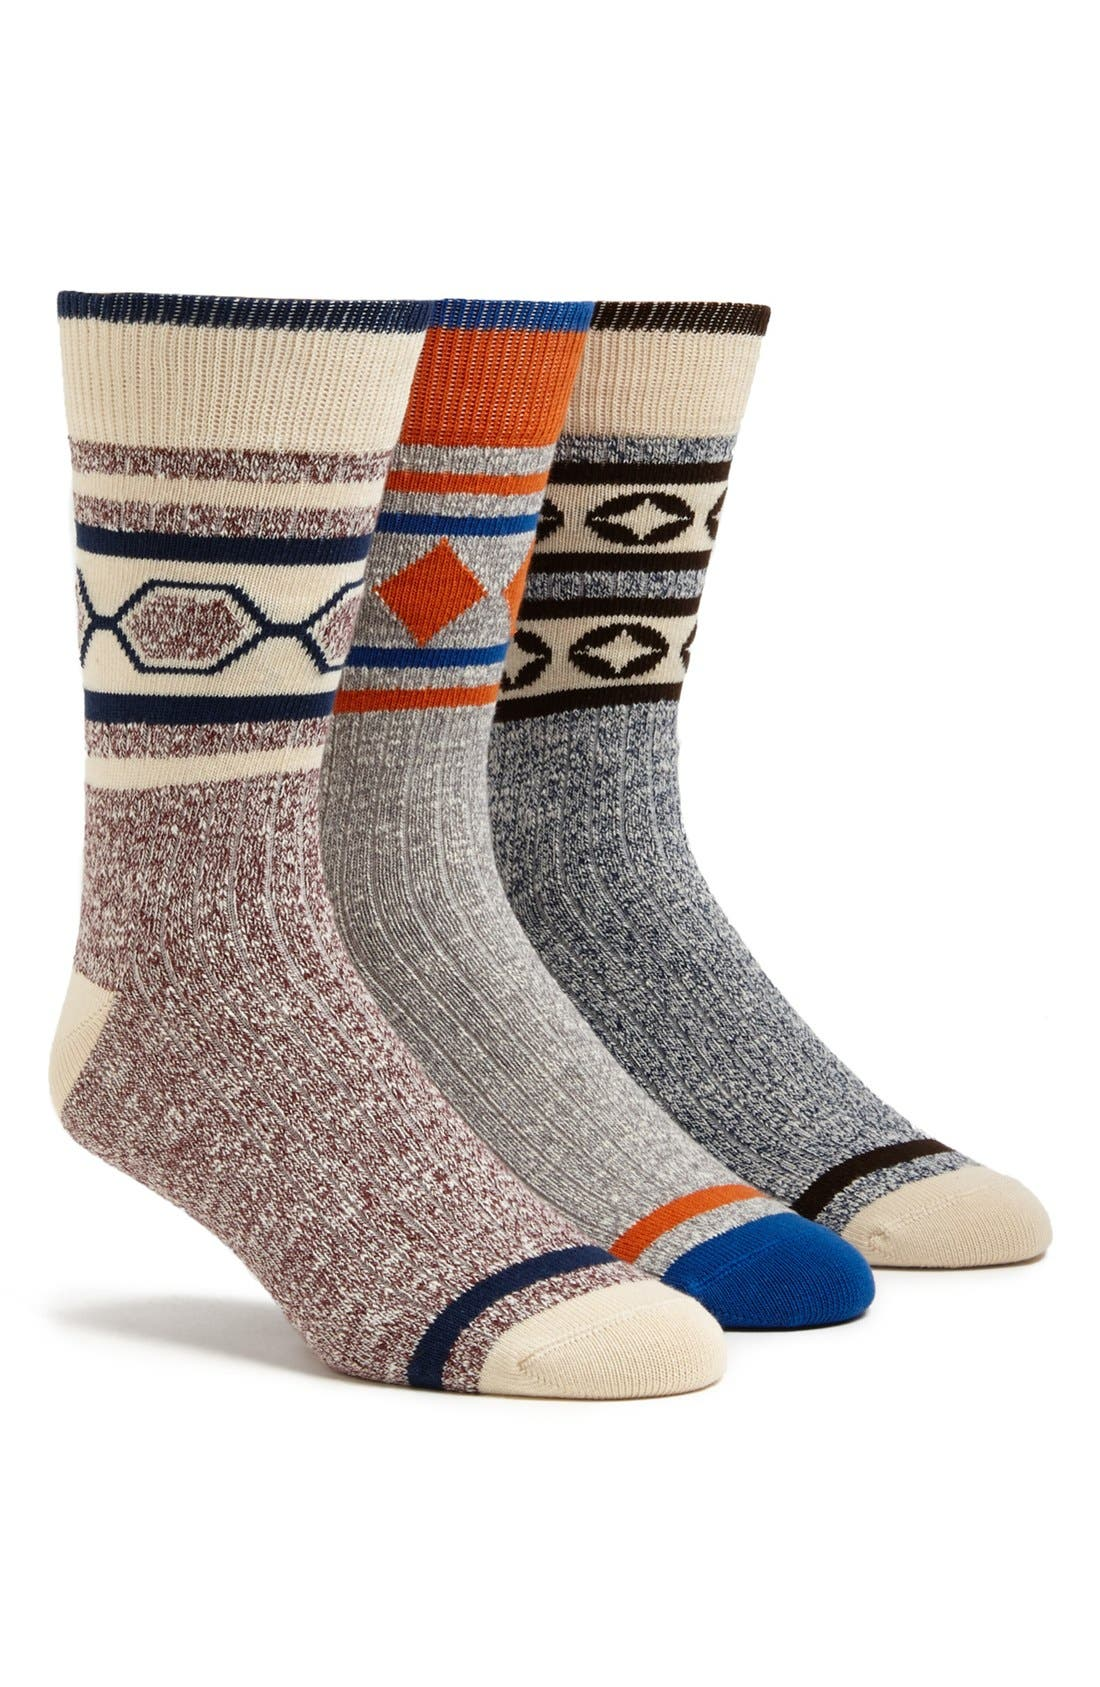 Main Image - Pact 'Camp' Socks (3-Pack)